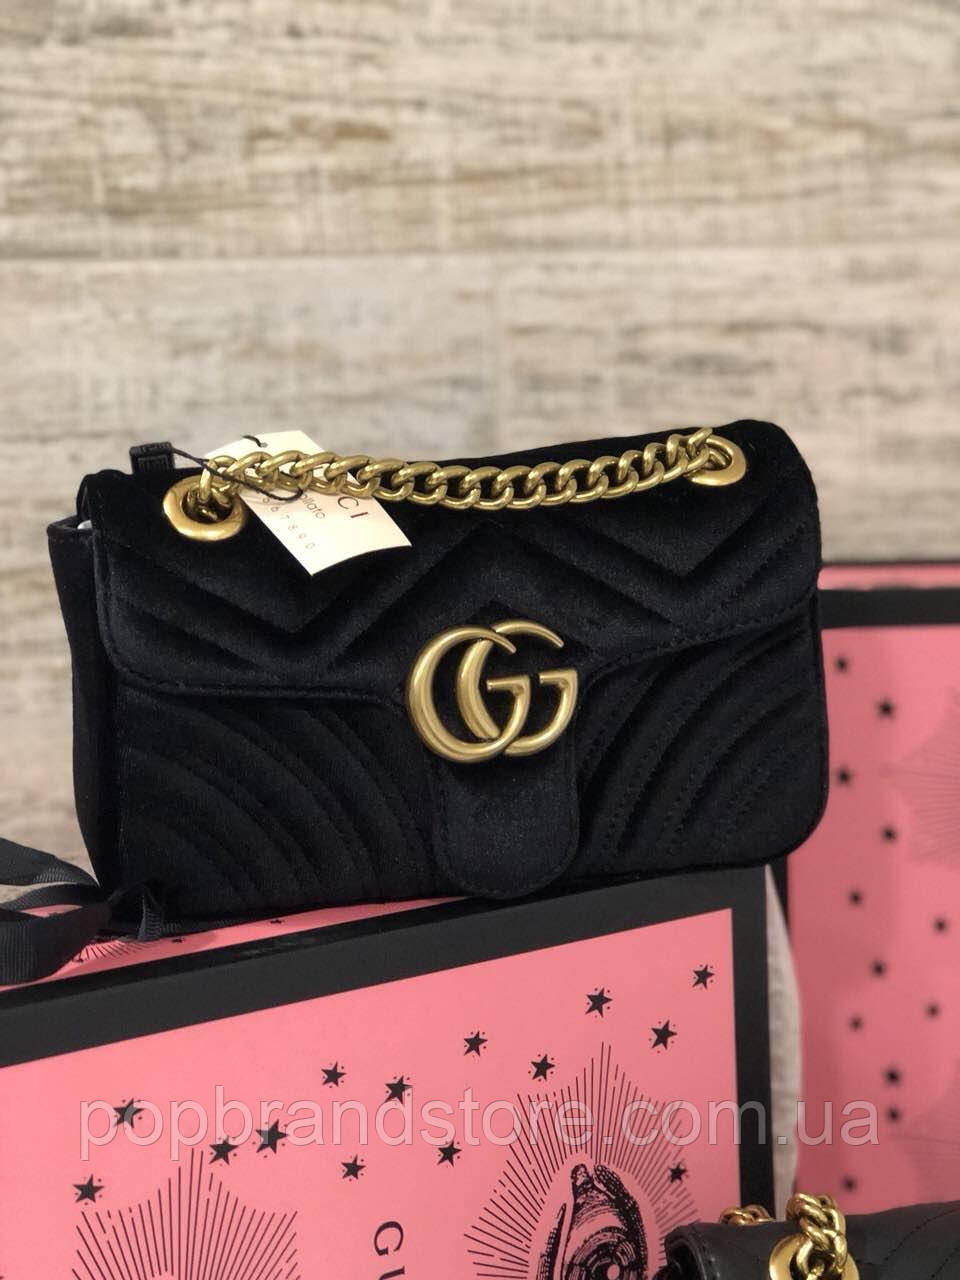 290f0bbb8ed3 Женская Сумочка на плечо Gucci  GG Marmont  22 cm бархат (реплика ...